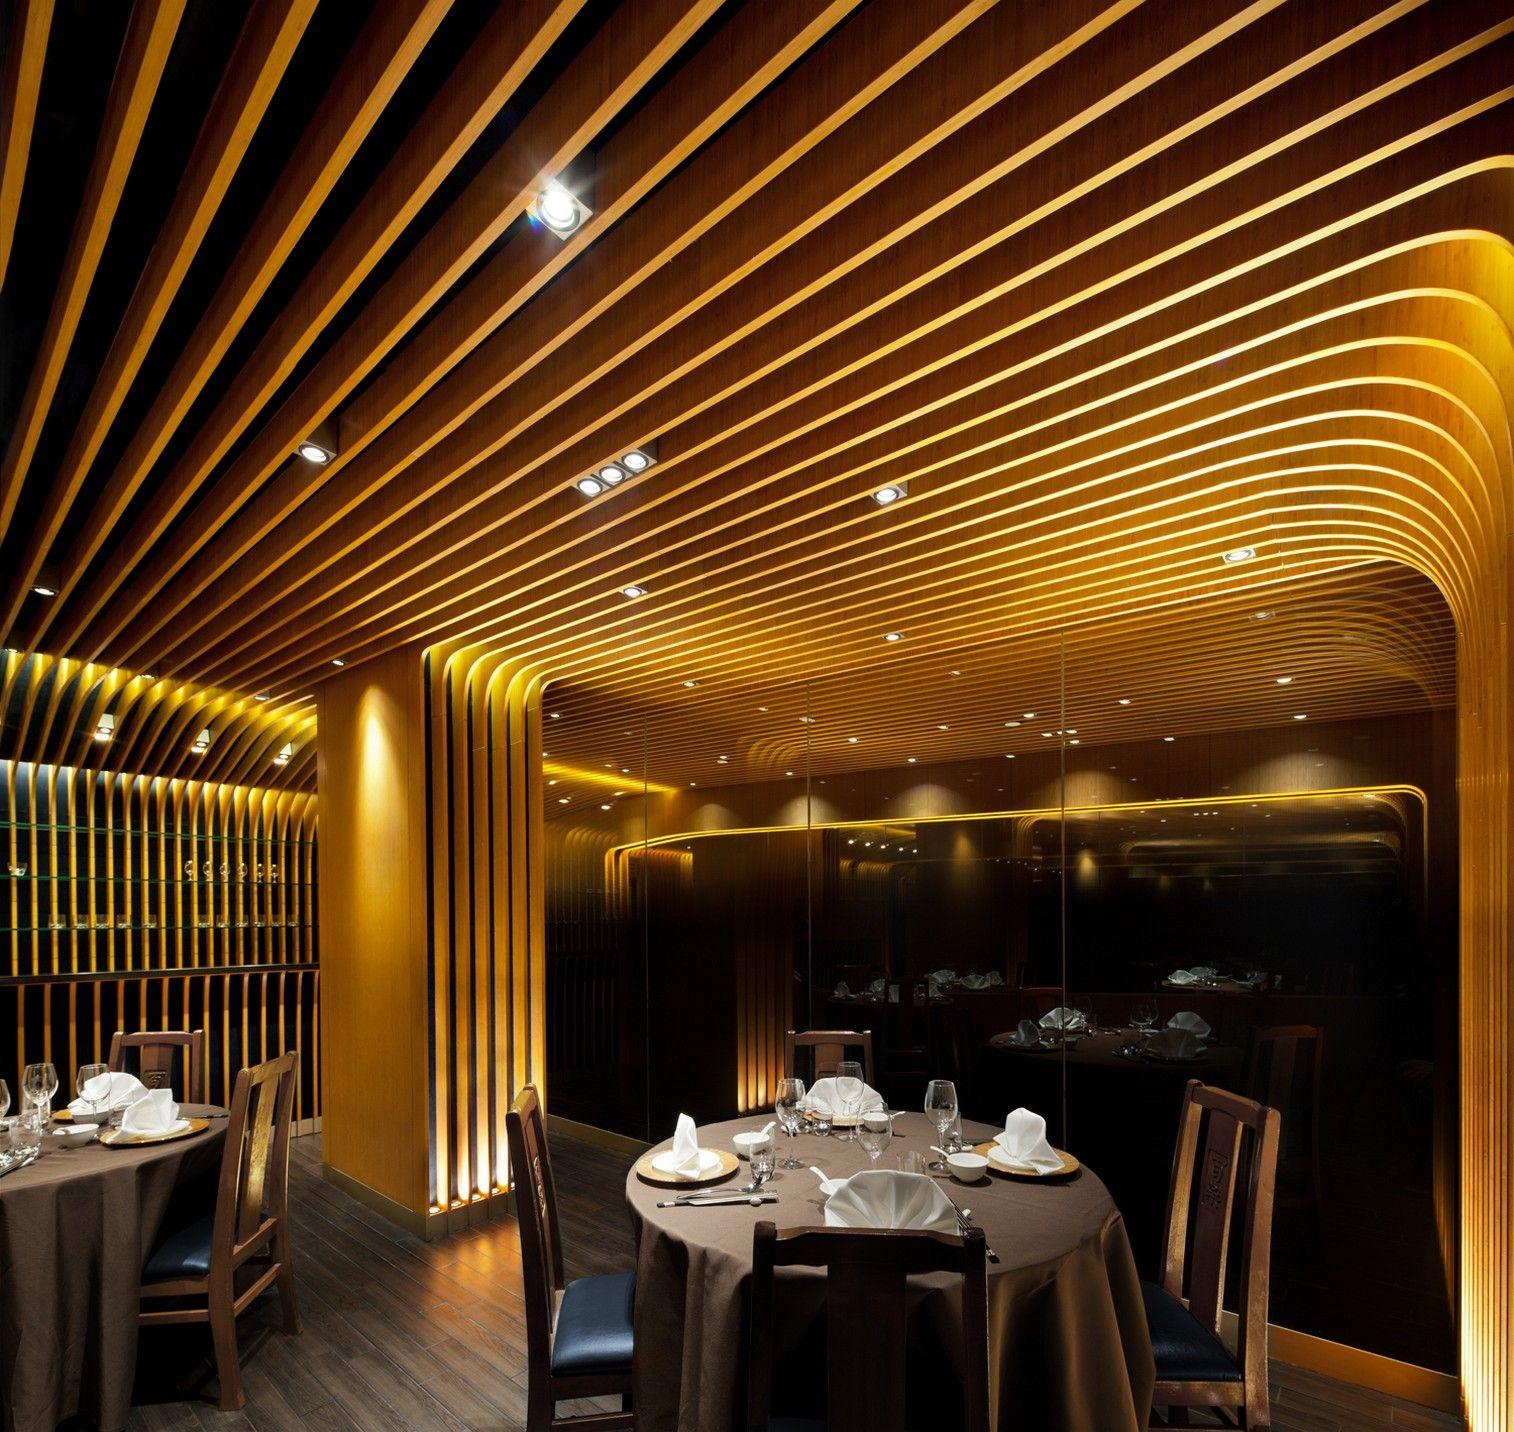 Pak loh chiu chow restaurant vip room